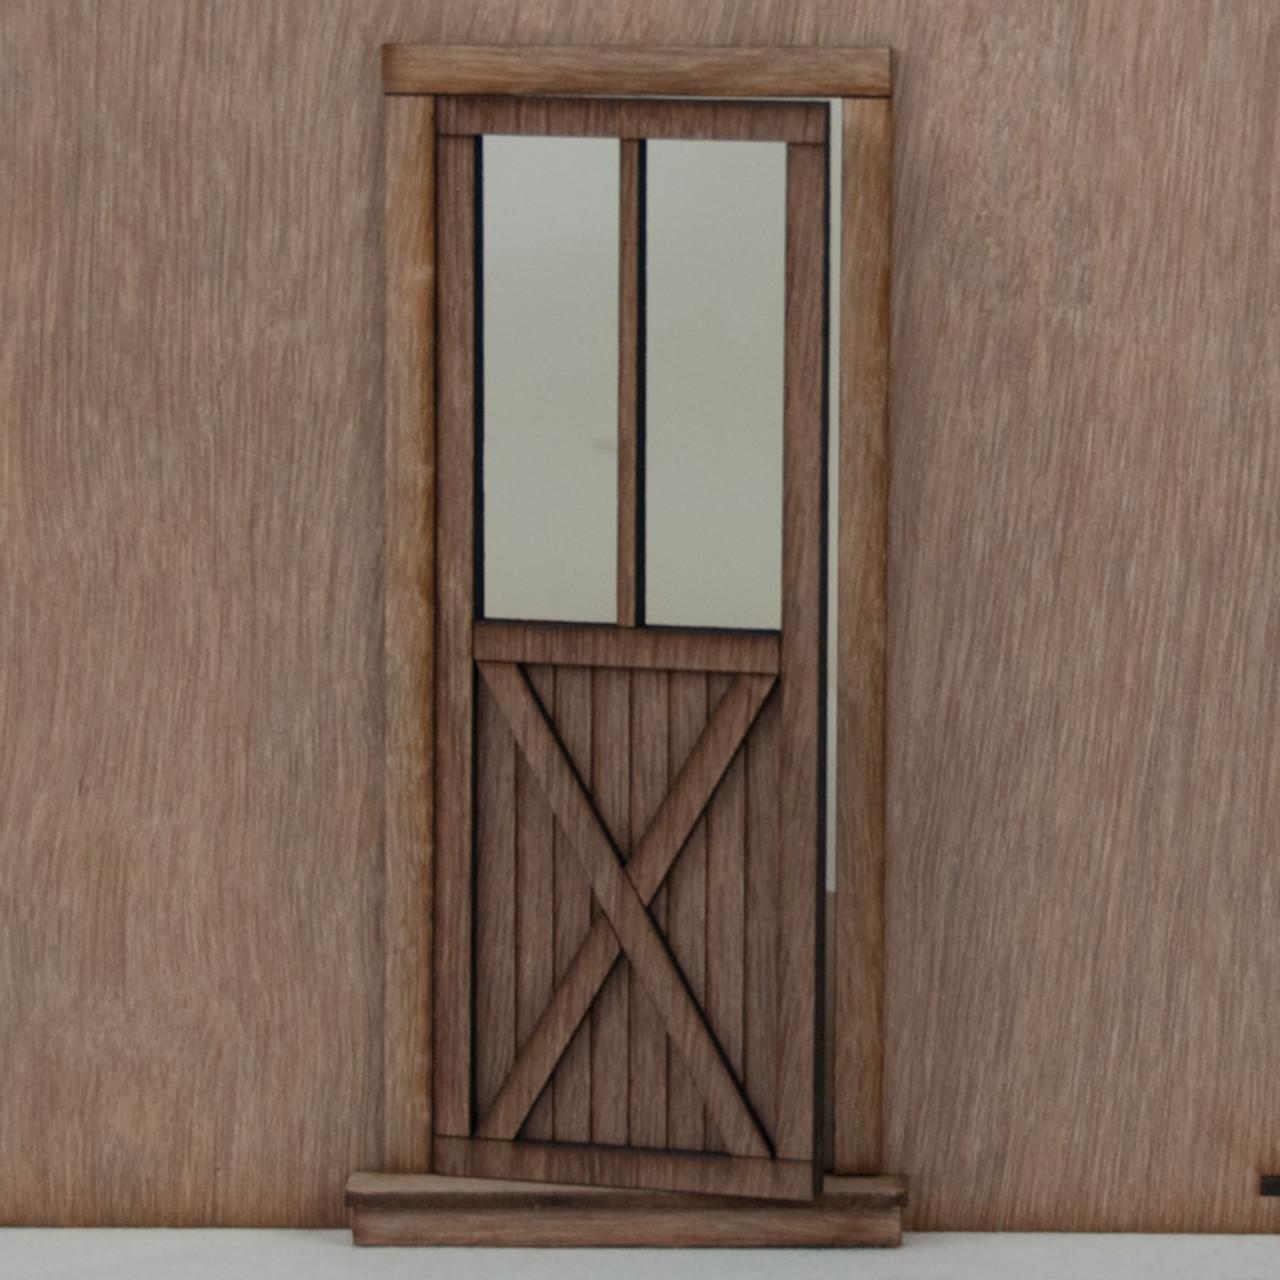 & Miniature Dollhouse Crossbuck Door